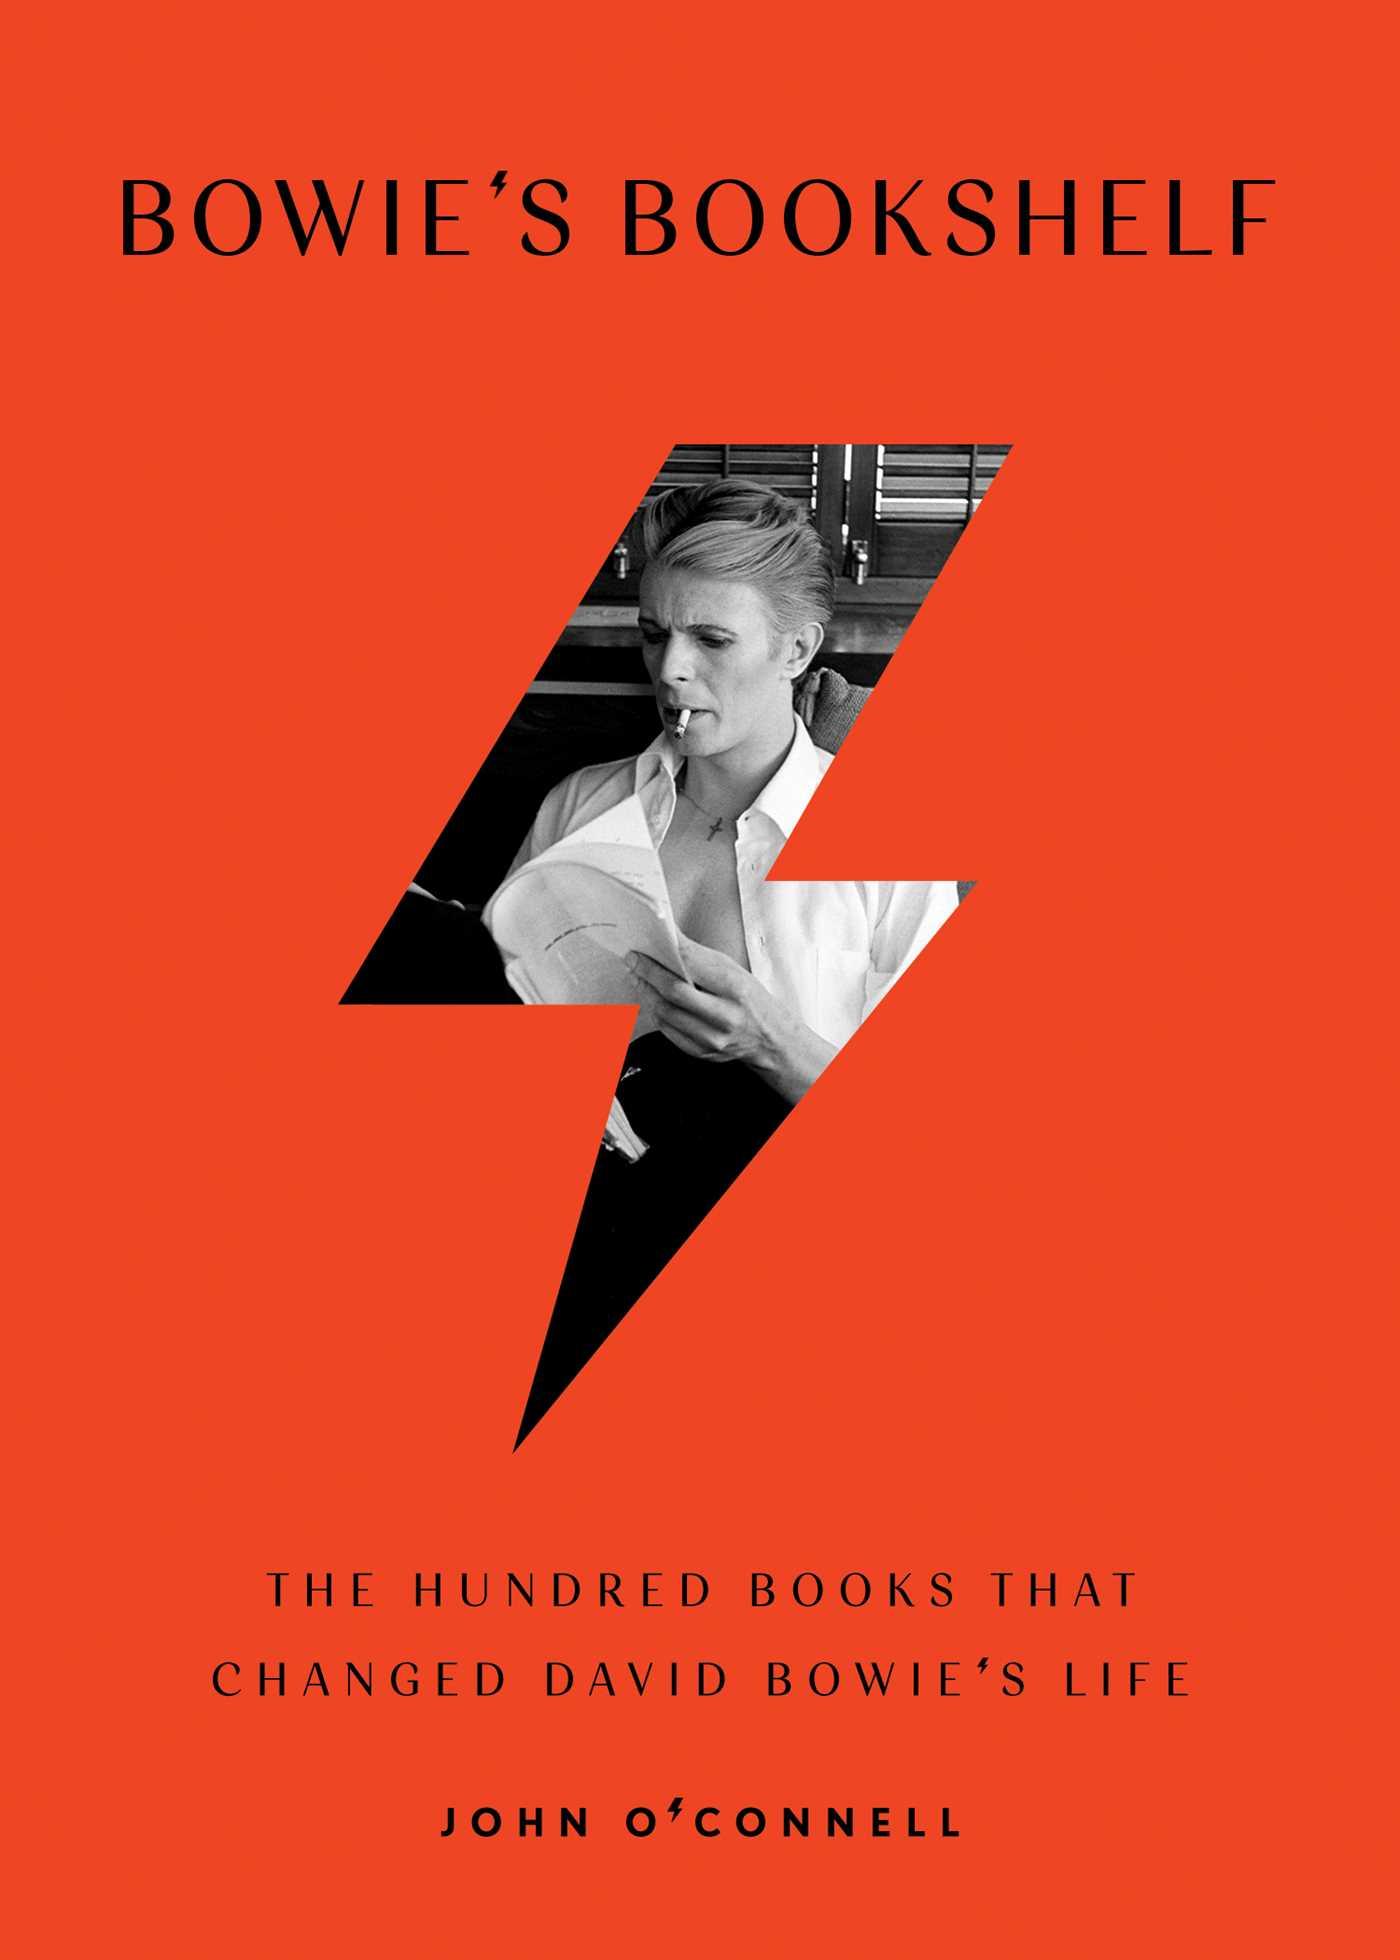 Bowie's Bookshelf Cover